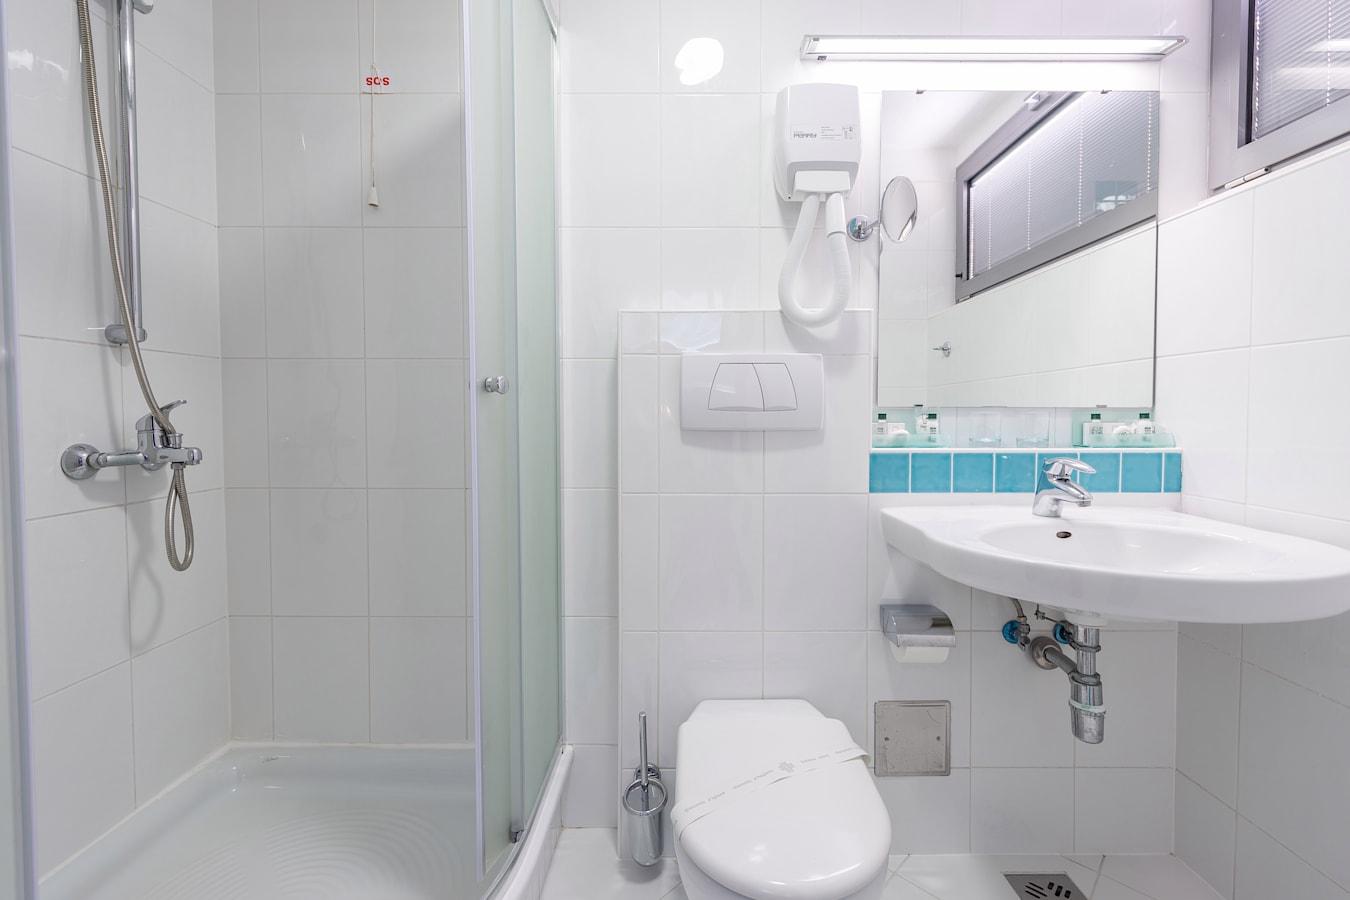 uvlala-hotel-room-bathroom-shower_1.jpg